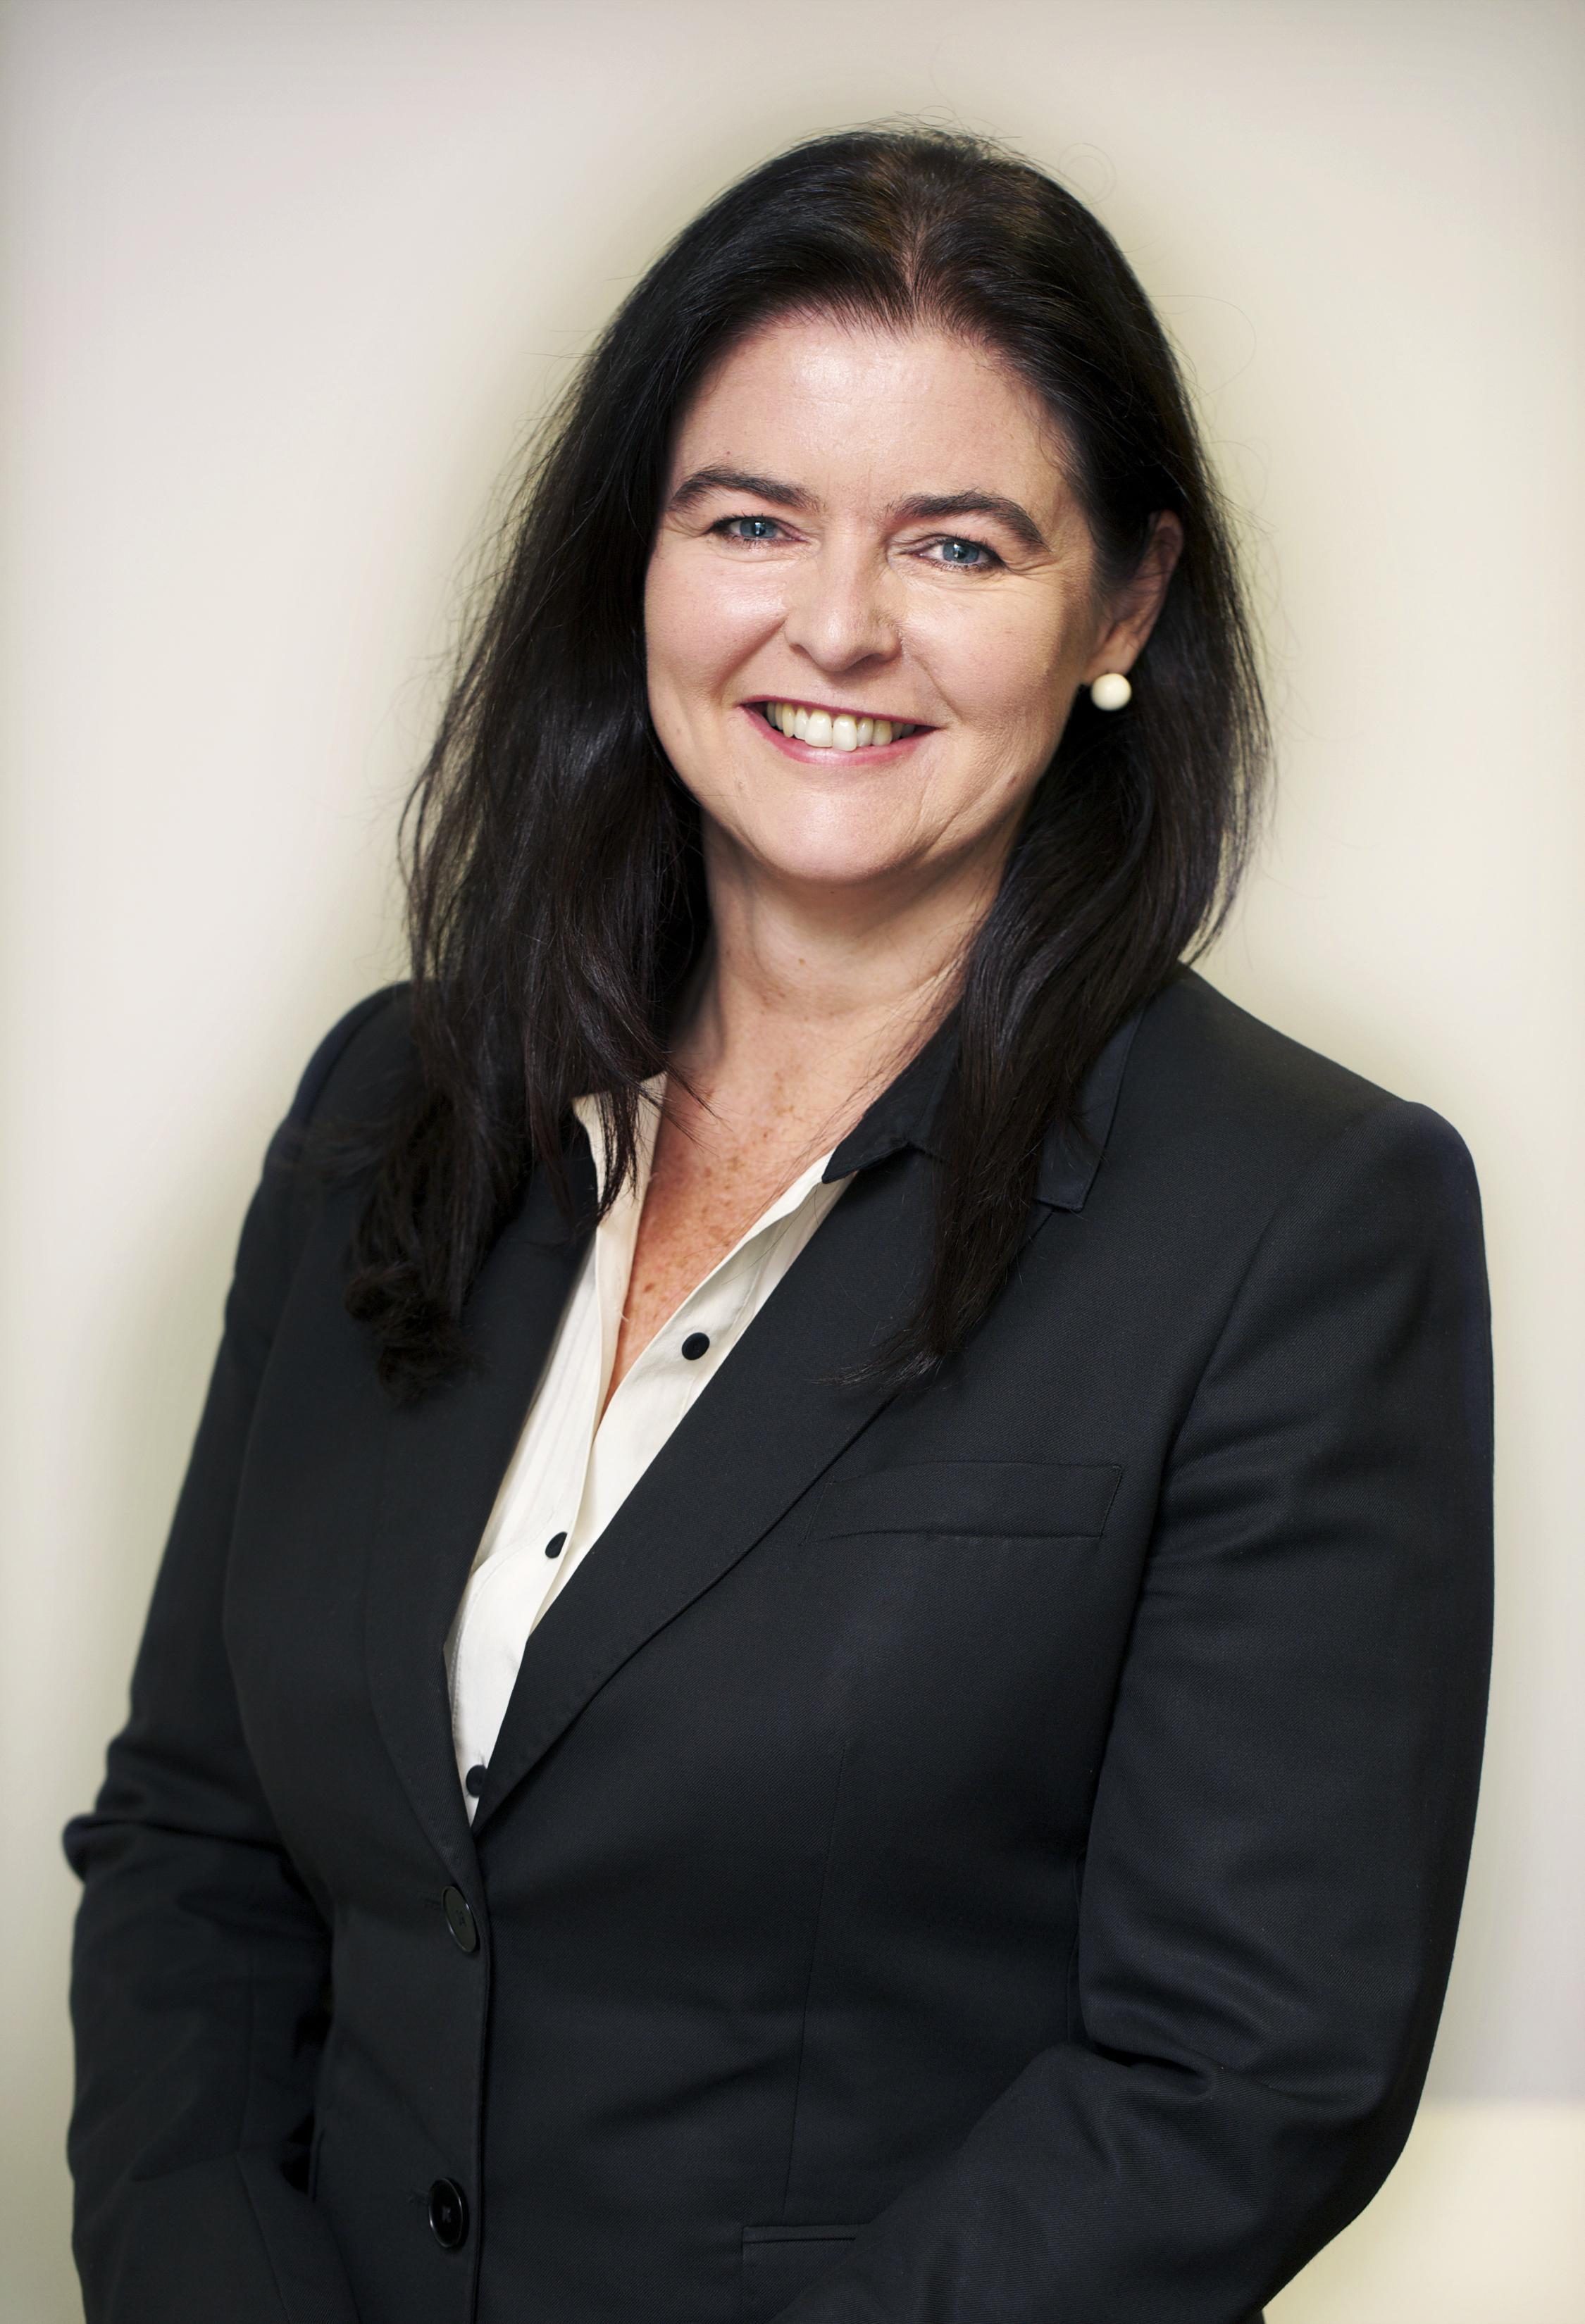 Jane Sharp, LLB (Hons), Grad Diploma Urban Planning, Ba Science